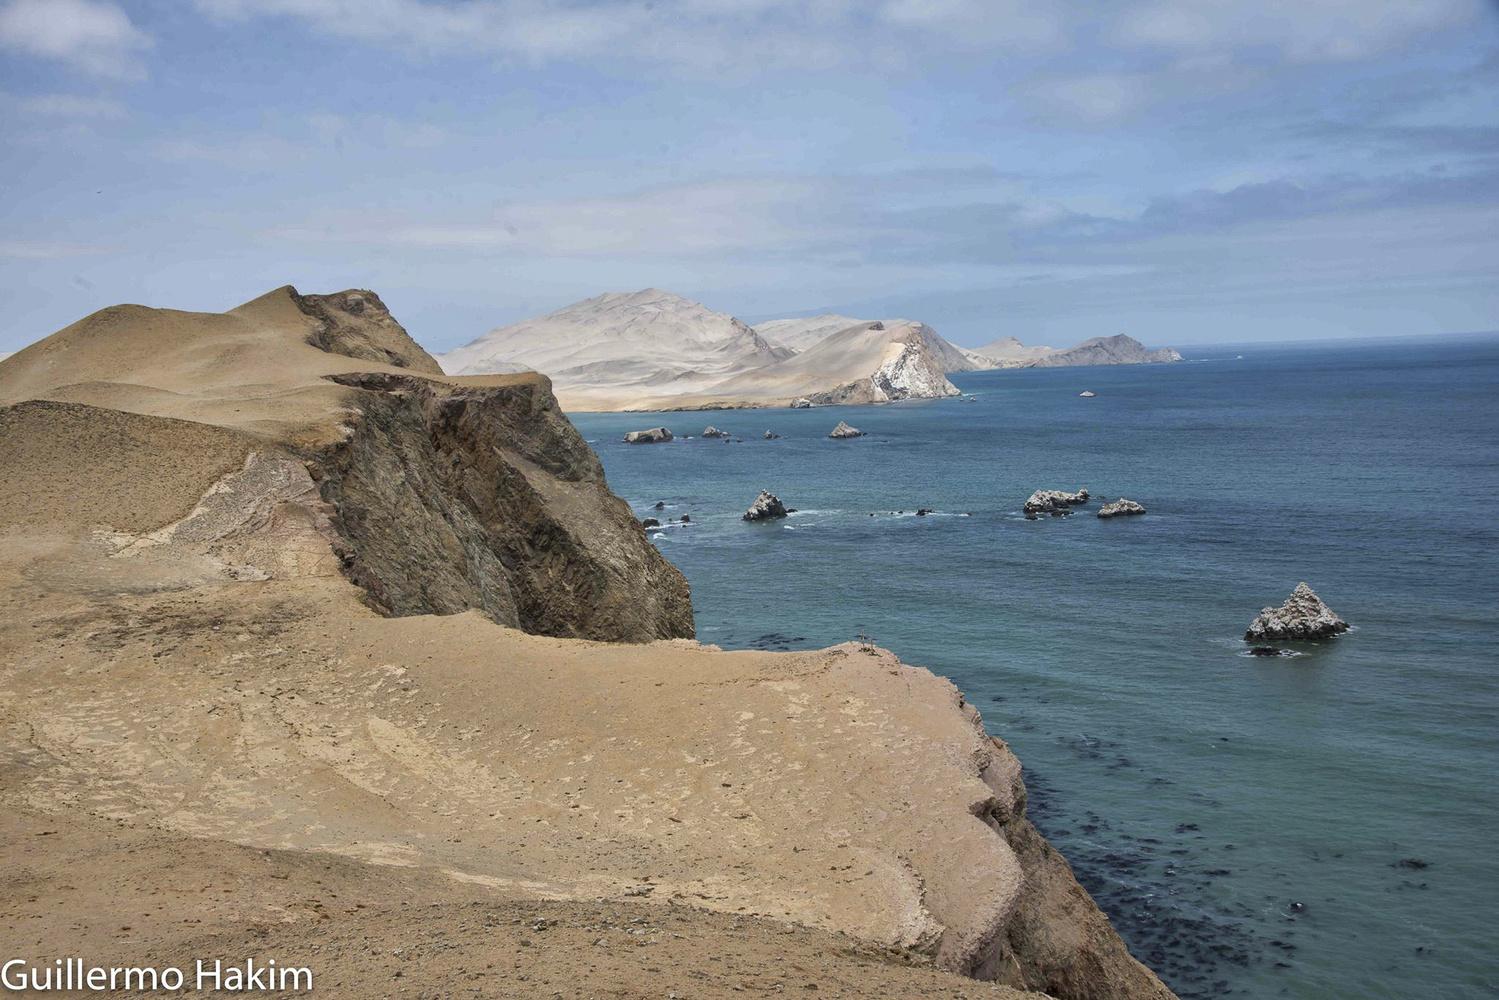 Cliffs meet the ocean by Guillermo Hakim